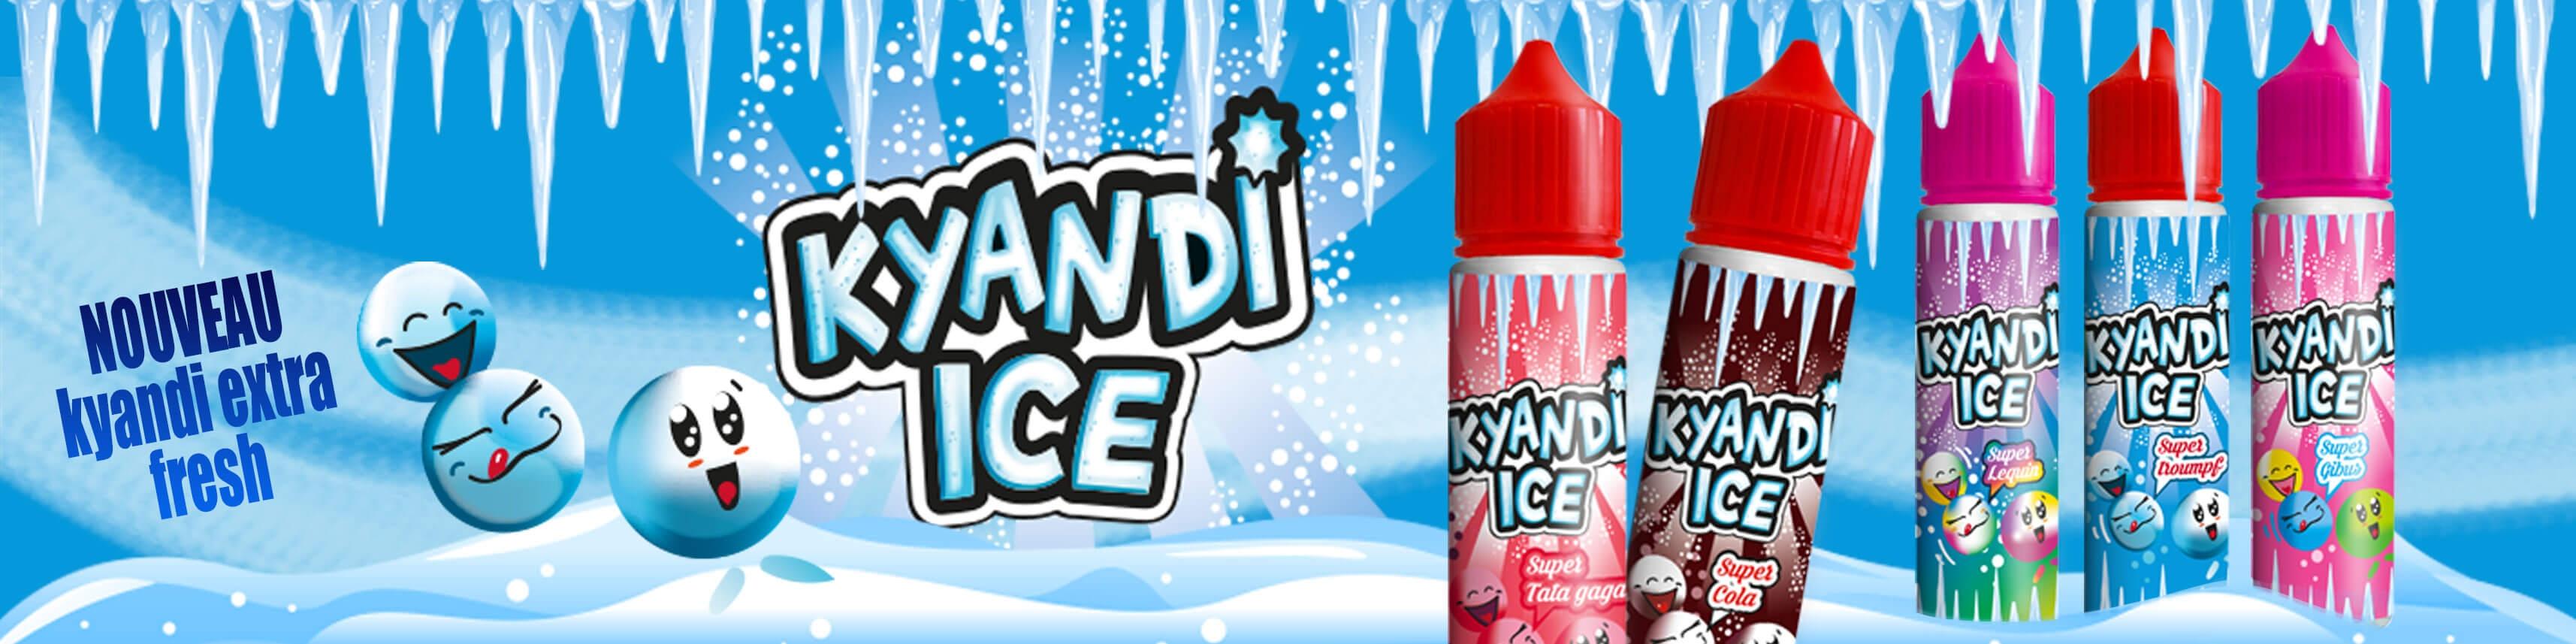 SLIDE-Kyandi-ICE